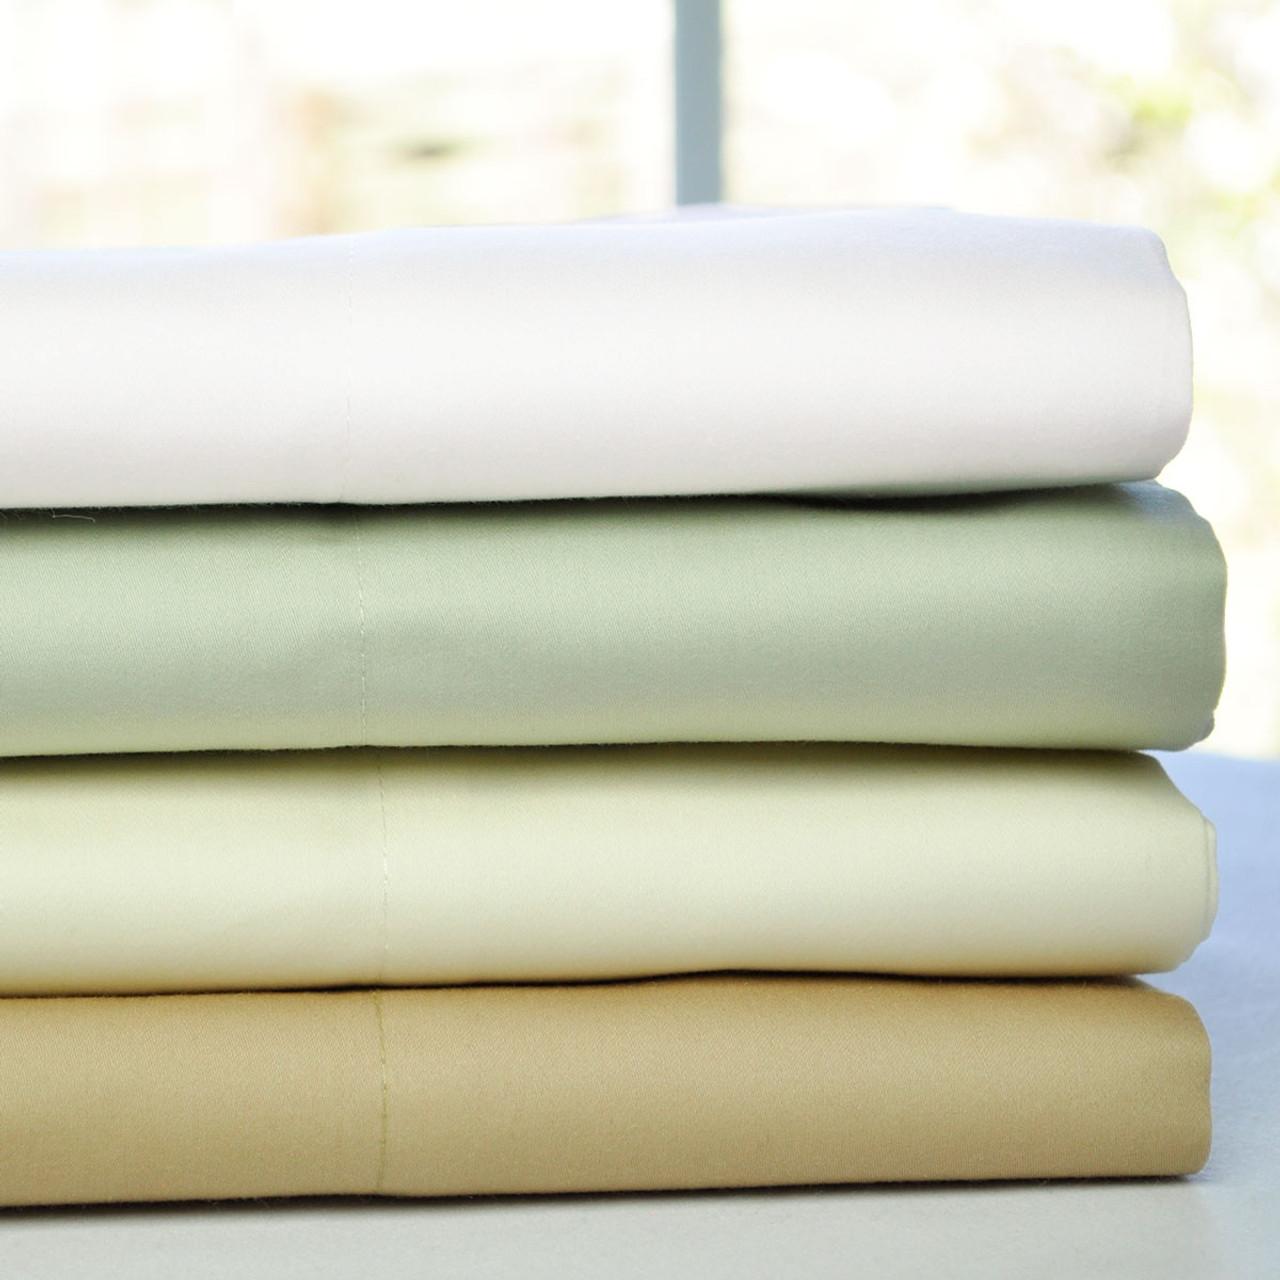 Outstanding Road Ready Sleeper Sofa Bed Sheet Set Machost Co Dining Chair Design Ideas Machostcouk